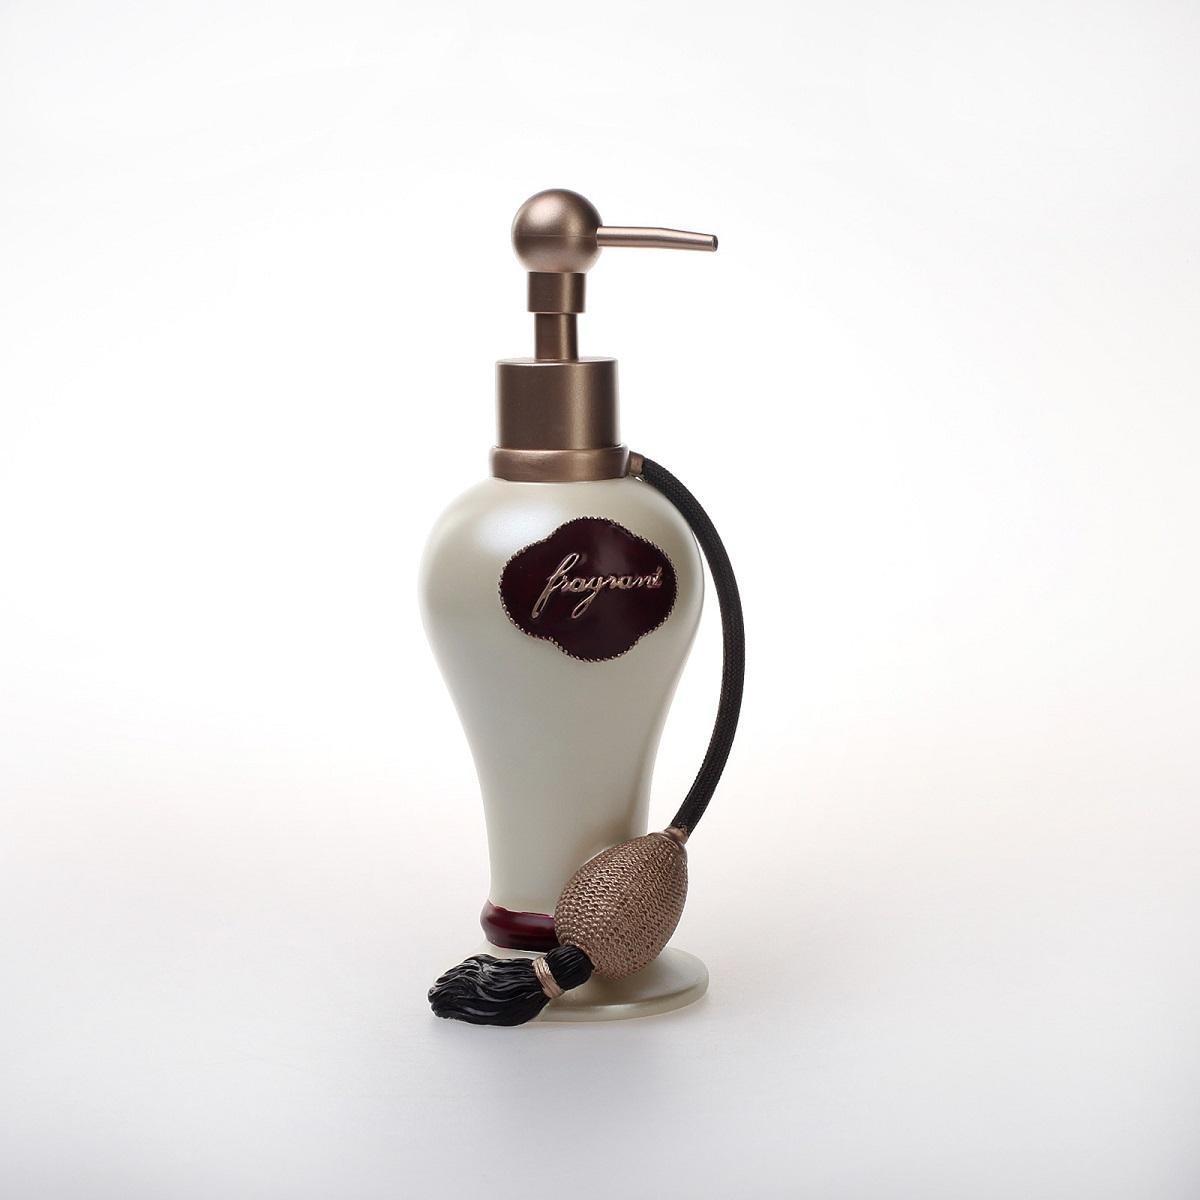 Дозаторы для мыла Дозатор для жидкого мыла Avanti Flirty dozator-dlya-zhidkogo-myla-flirty-ot-avanti-ssha-kitay.jpg